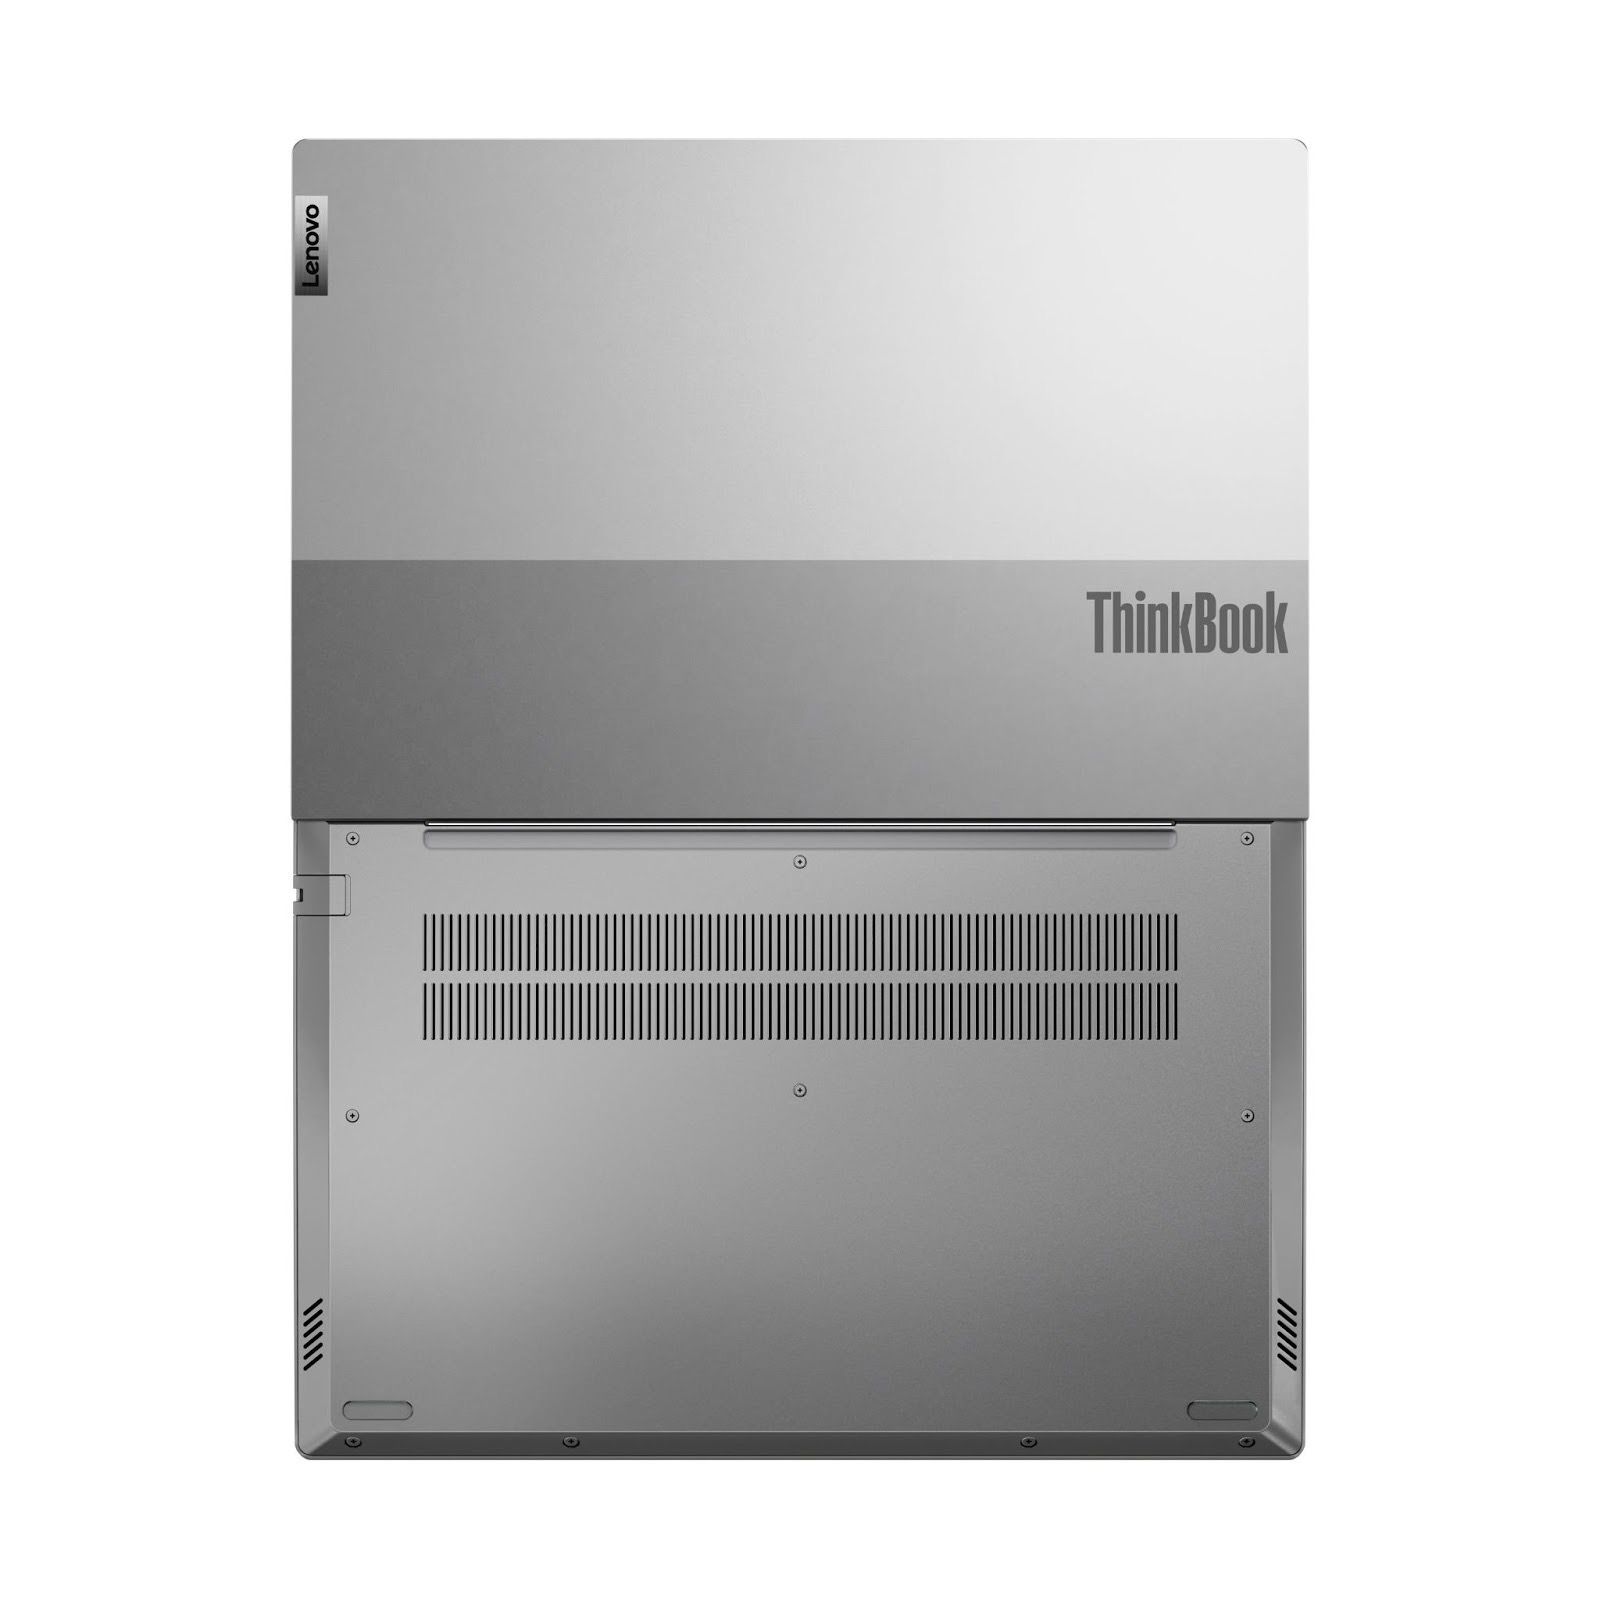 Фото 4. Ноутбук Lenovo ThinkBook 14 Gen 2 ARE Mineral Grey (20VF0039RU)